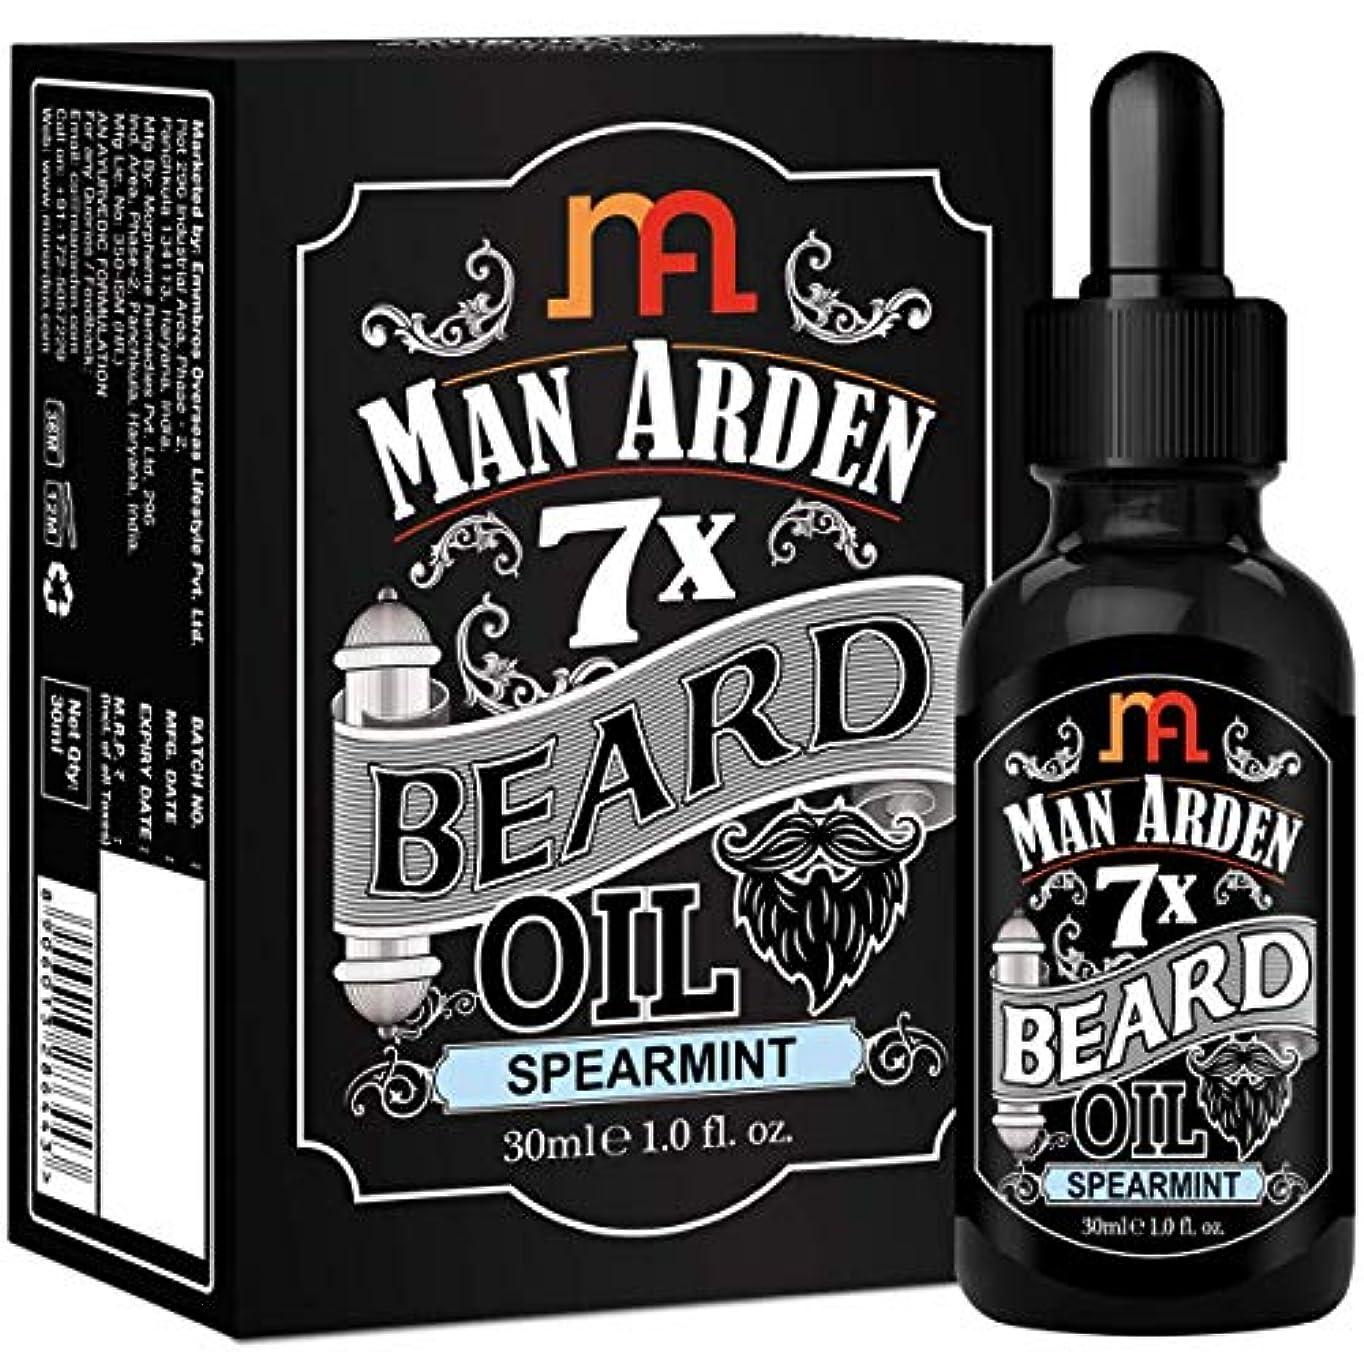 転送疾患管理者Man Arden 7X Beard Oil 30ml (Spearmint) - 7 Premium Oils For Beard Growth & Nourishment